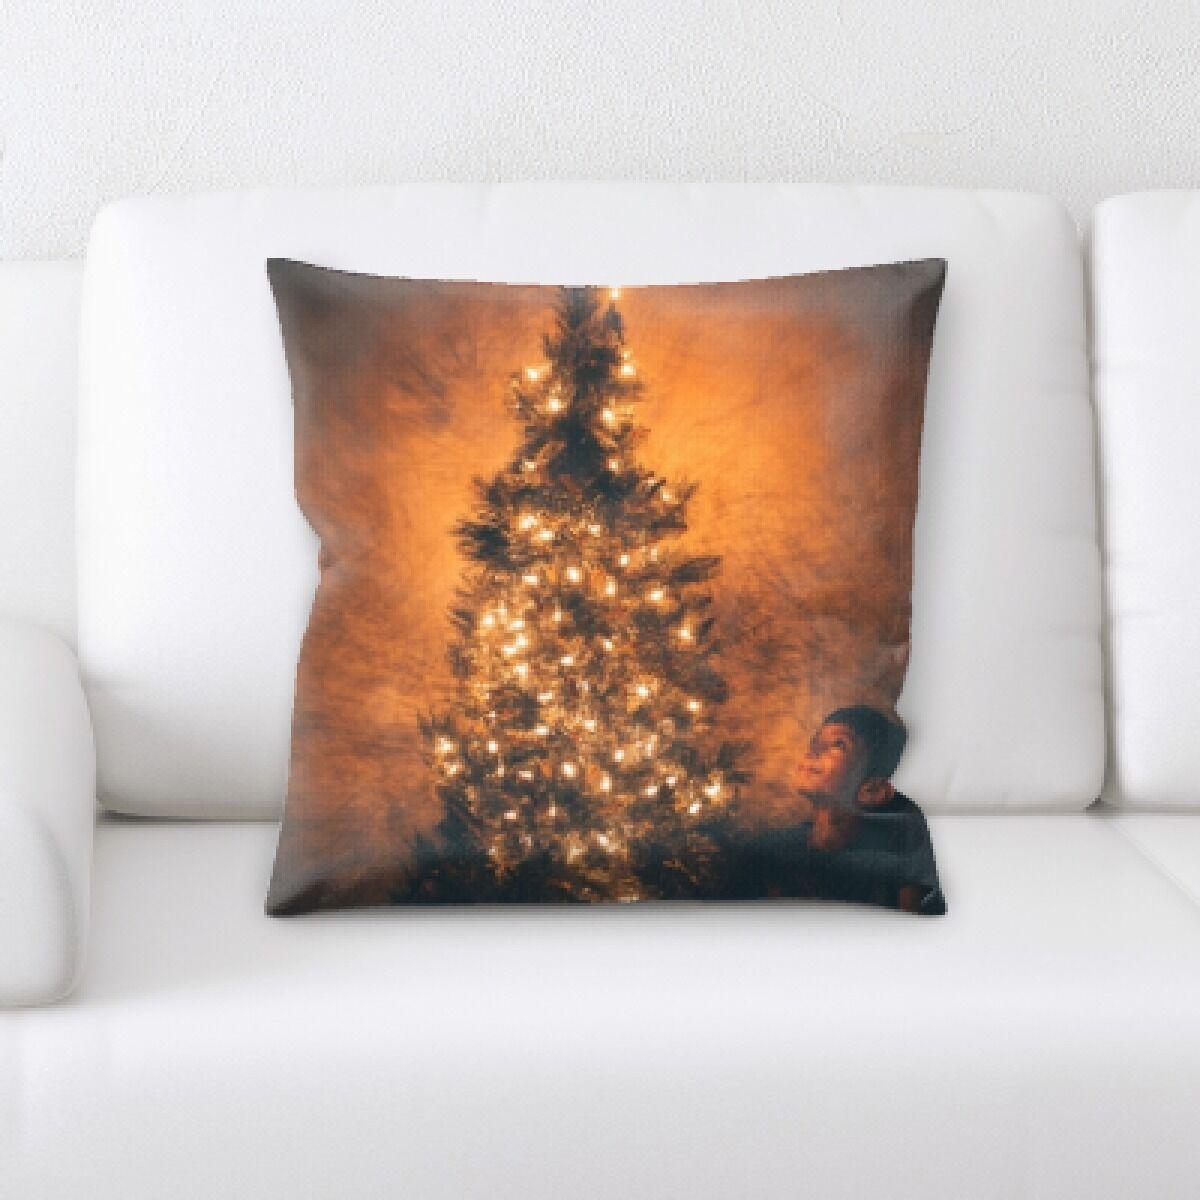 Congo Christmas Tree (3) Throw Pillow